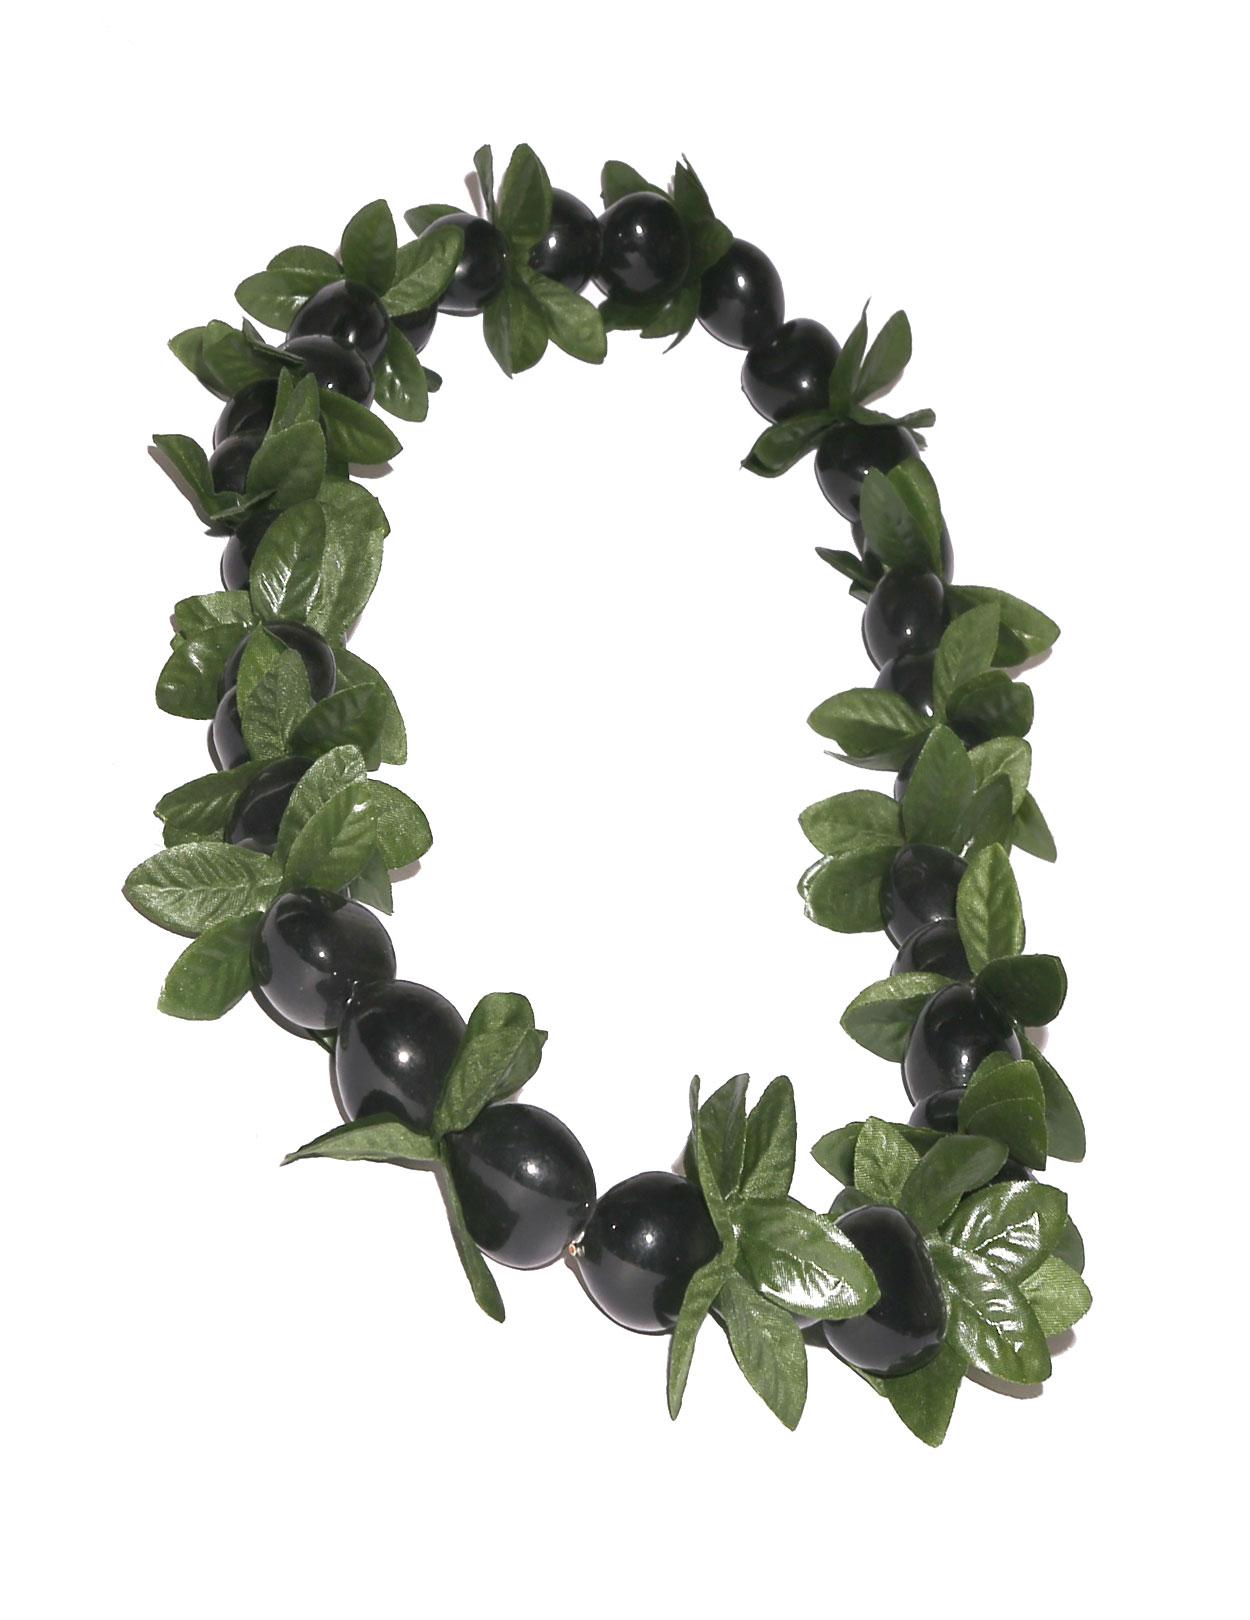 Leis from hawaii headbands anklets shaka time hawaii black kukui nut and point leaf leis hawaii izmirmasajfo